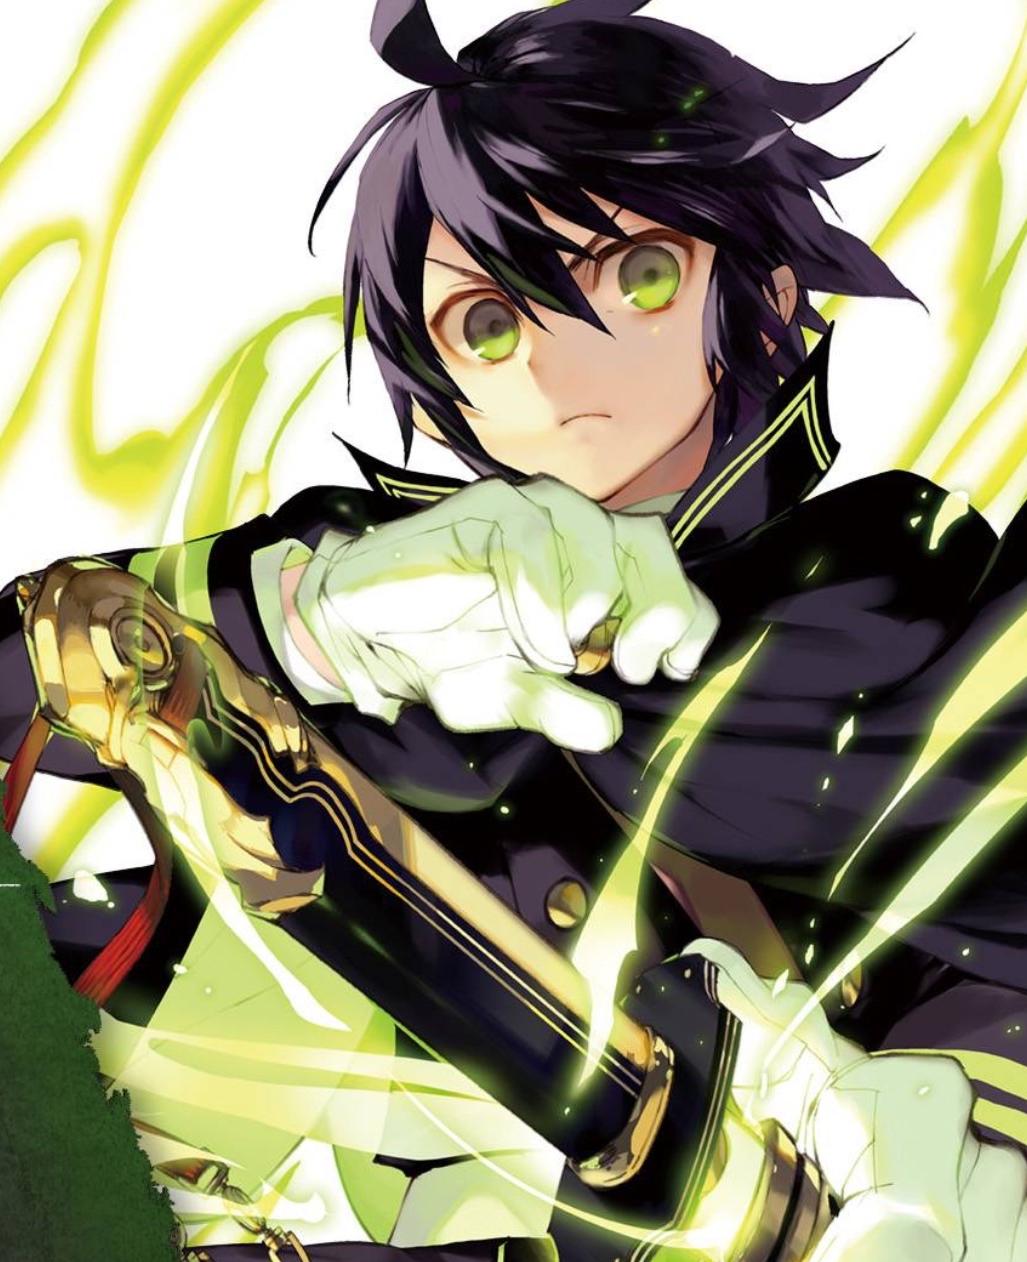 Anime Action Terbaik Owari no Seraph Yuichiro Hyakuya